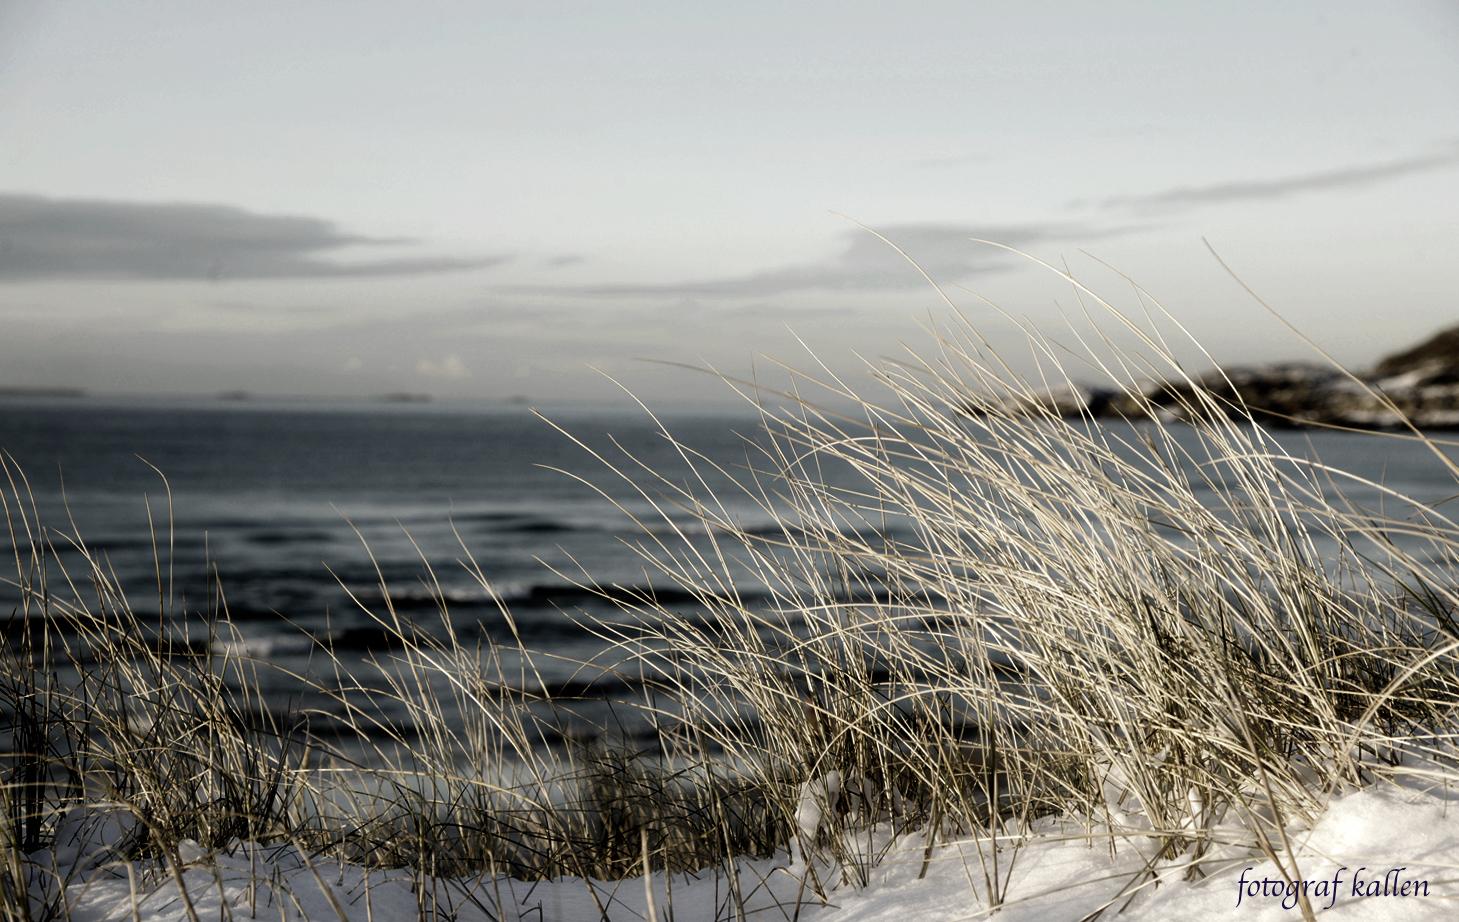 Naturfotografi 4. desember 2017 - fotografkallen.com